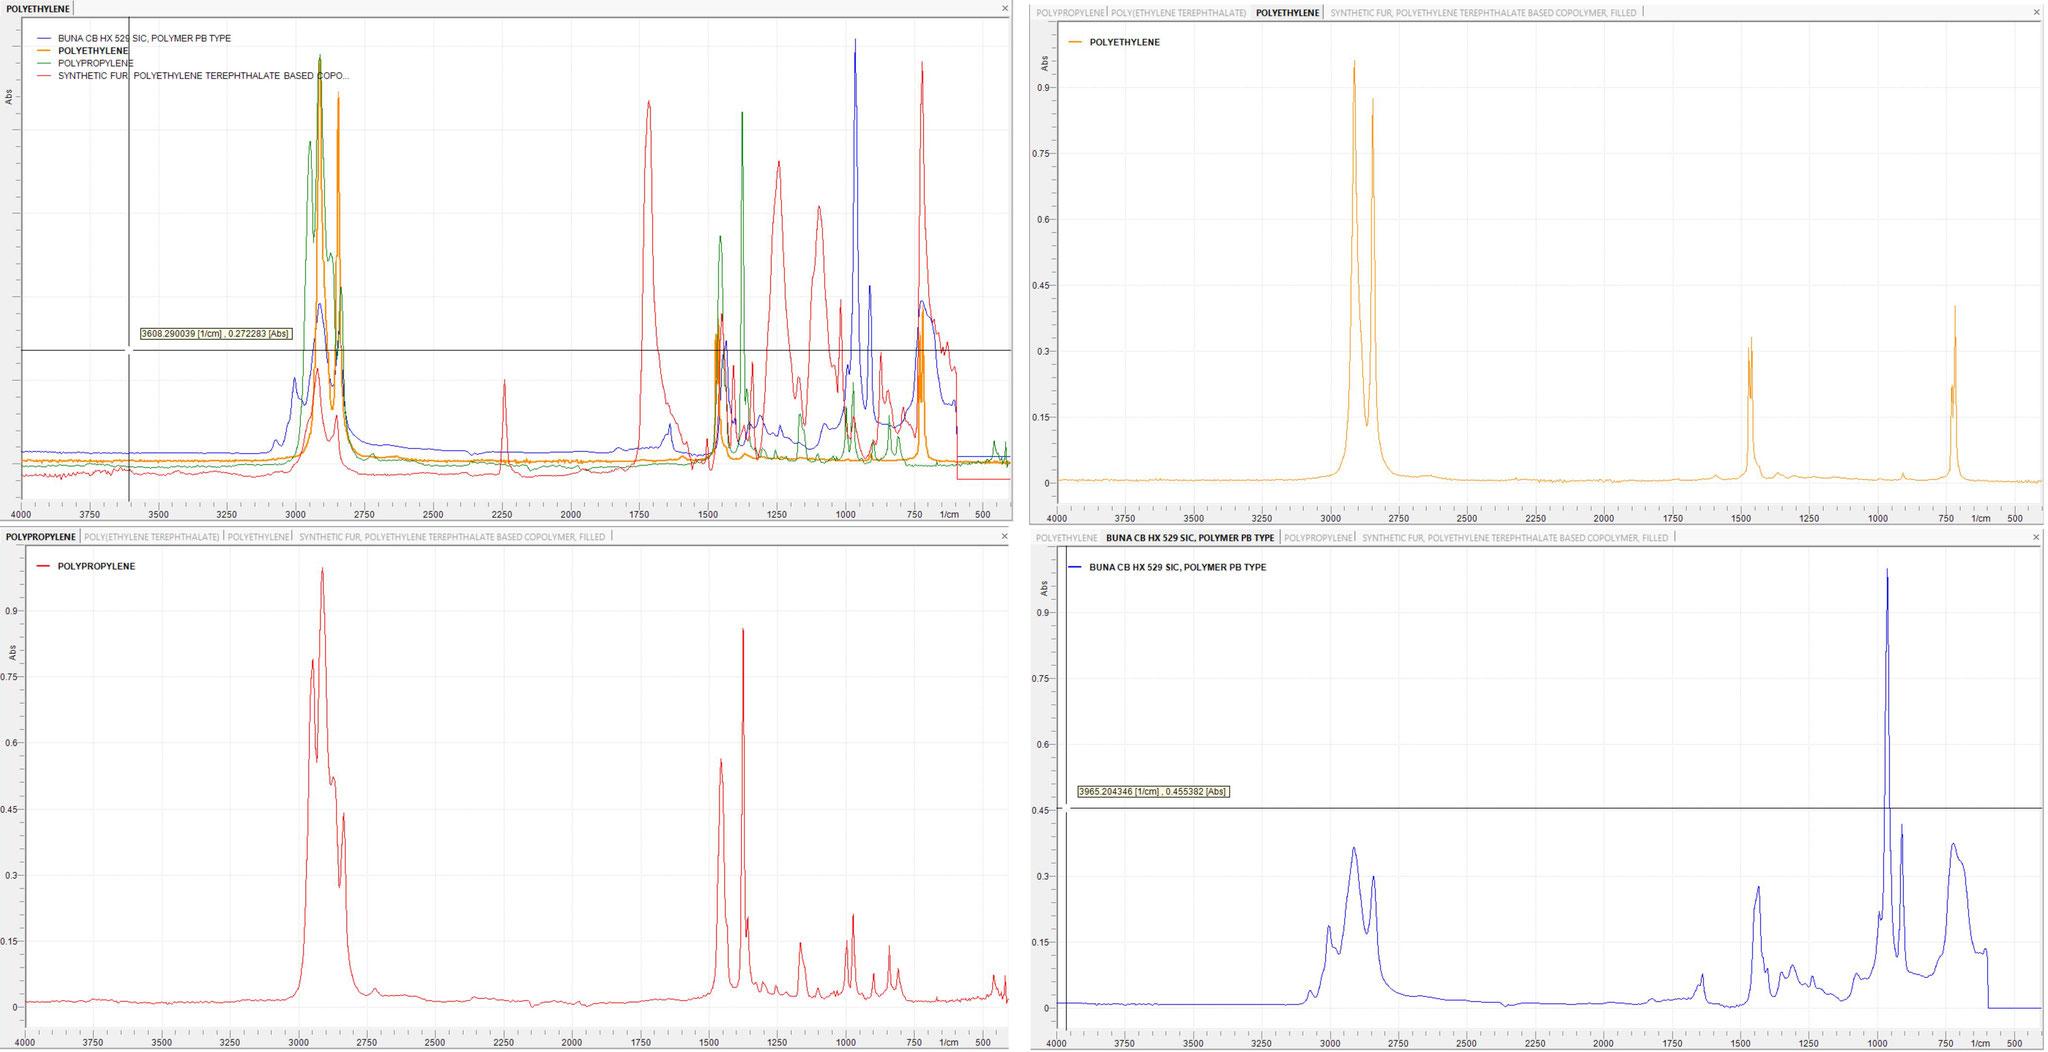 ATR-FTIR spectra of PE, PET, PBT, PP